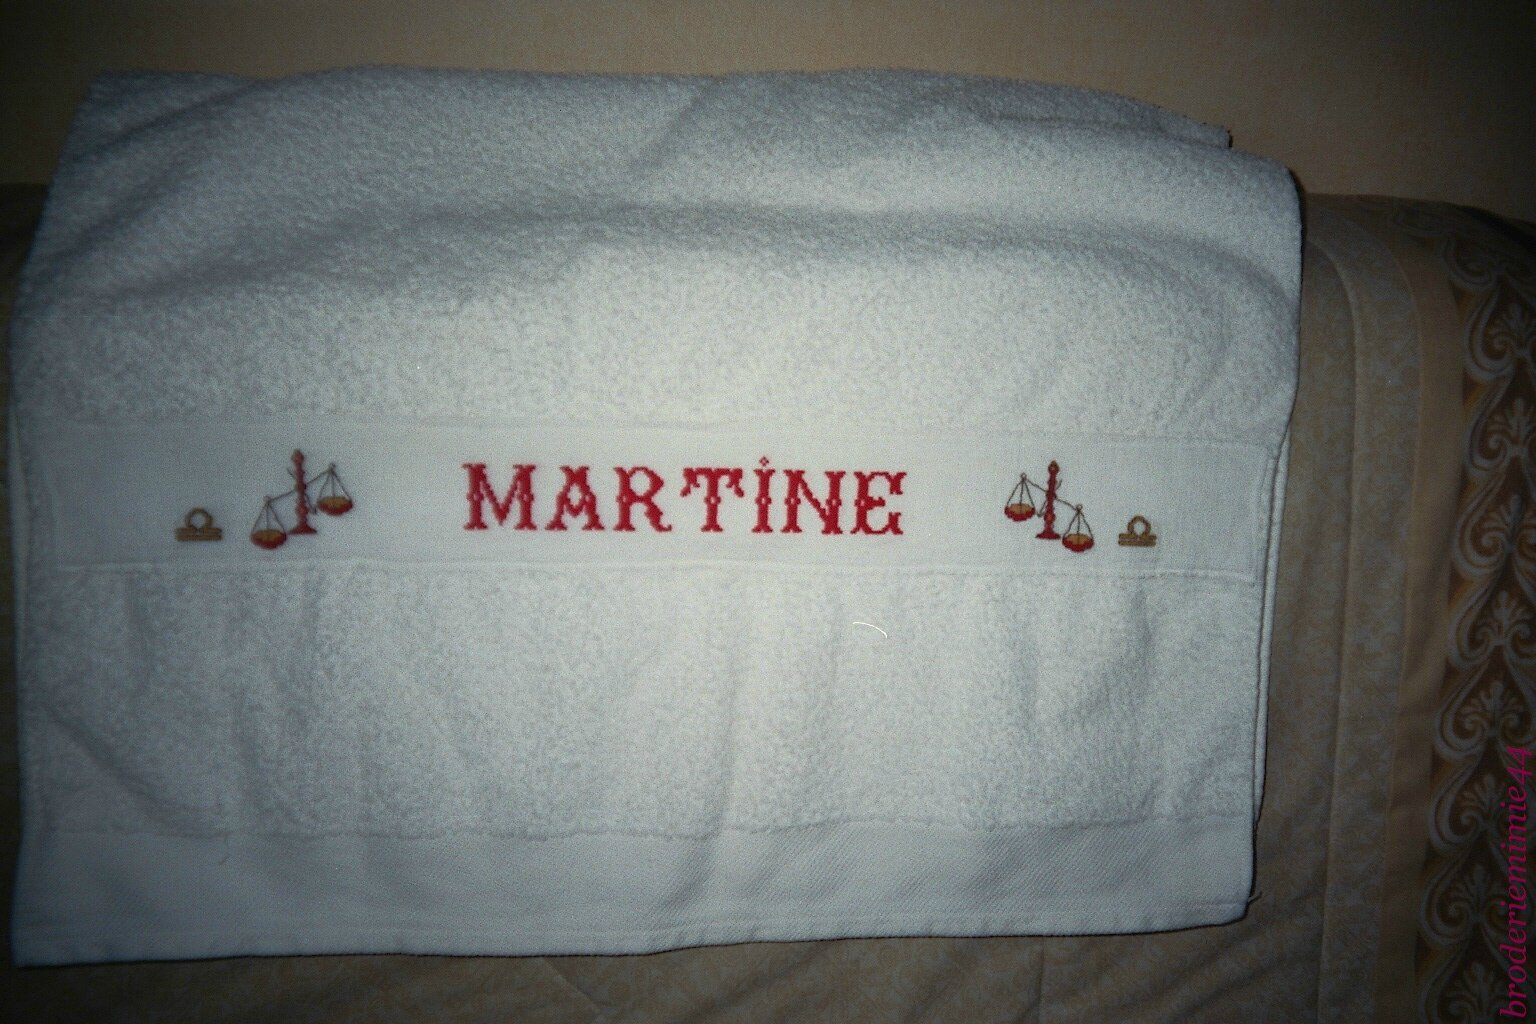 MARTINE - BALANCE